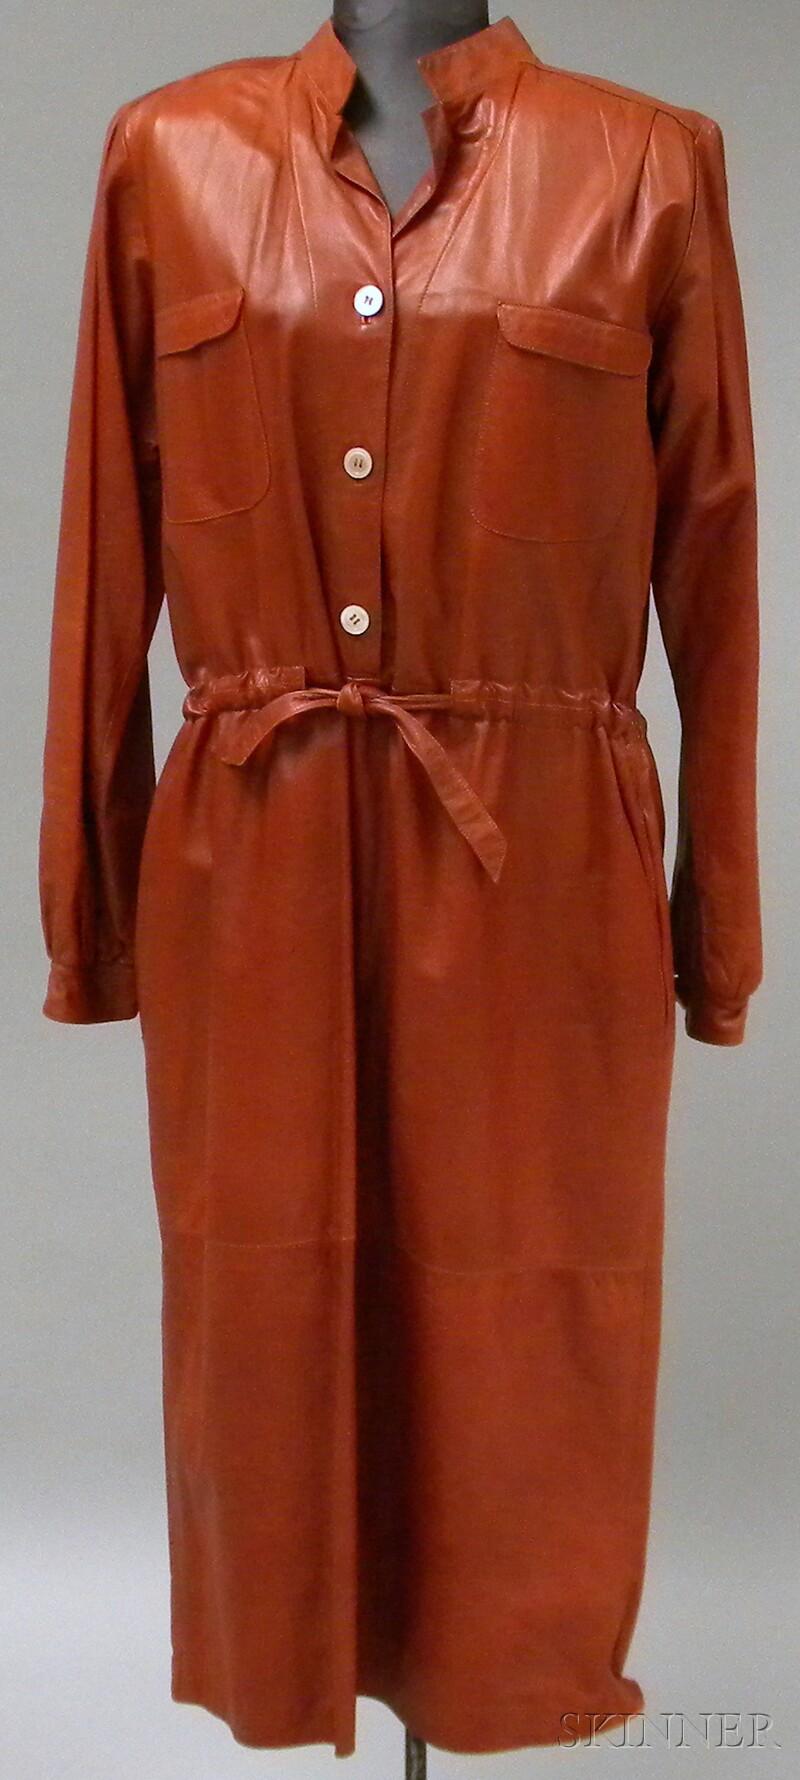 Vintage Italian Rust-colored Leather Dress